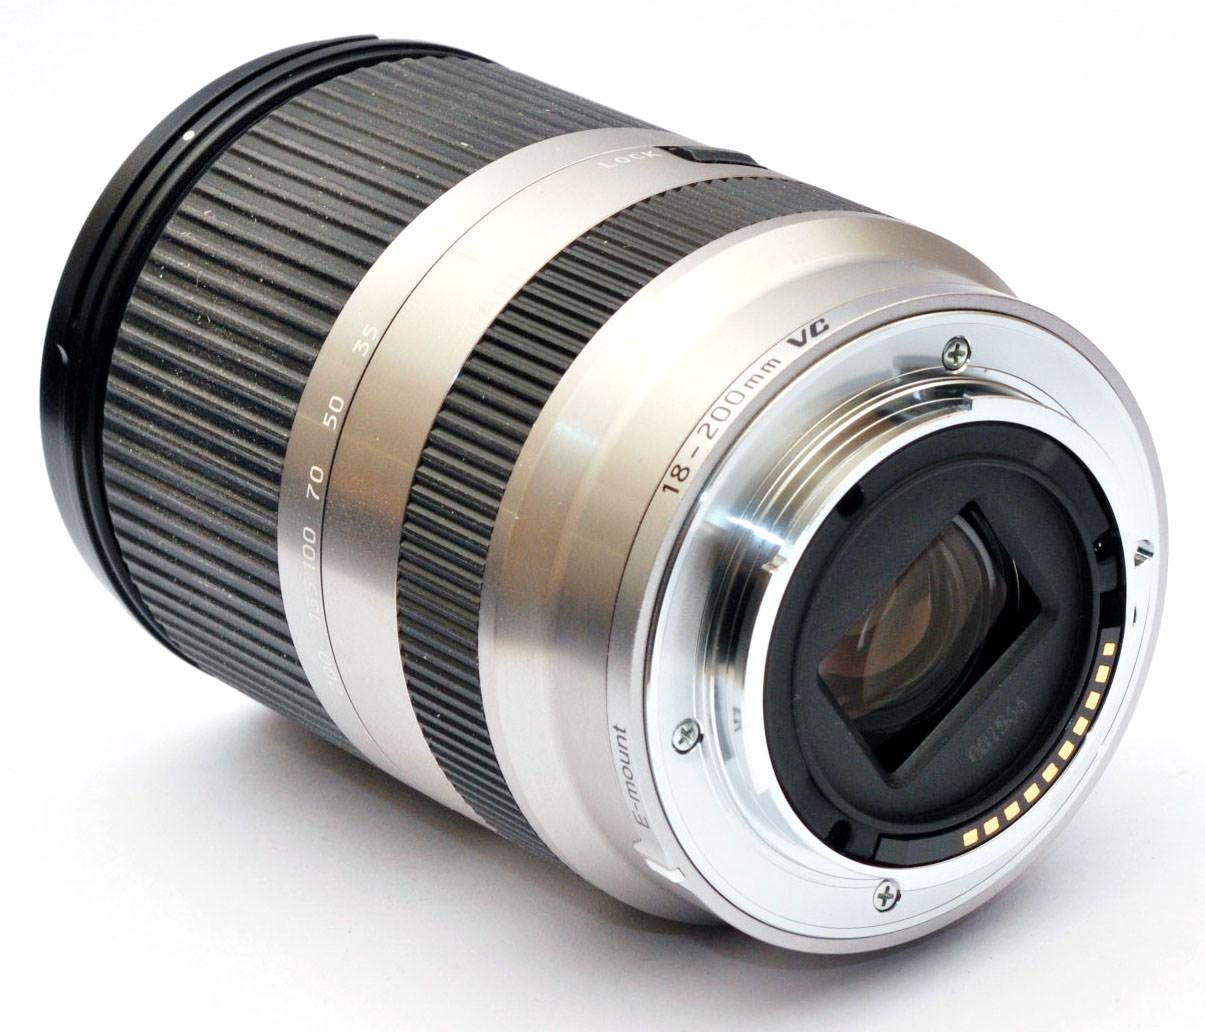 Tamron 18 200mm F 3 5 6 3 Di Iii Vc Nex Lens Review Ephotozine